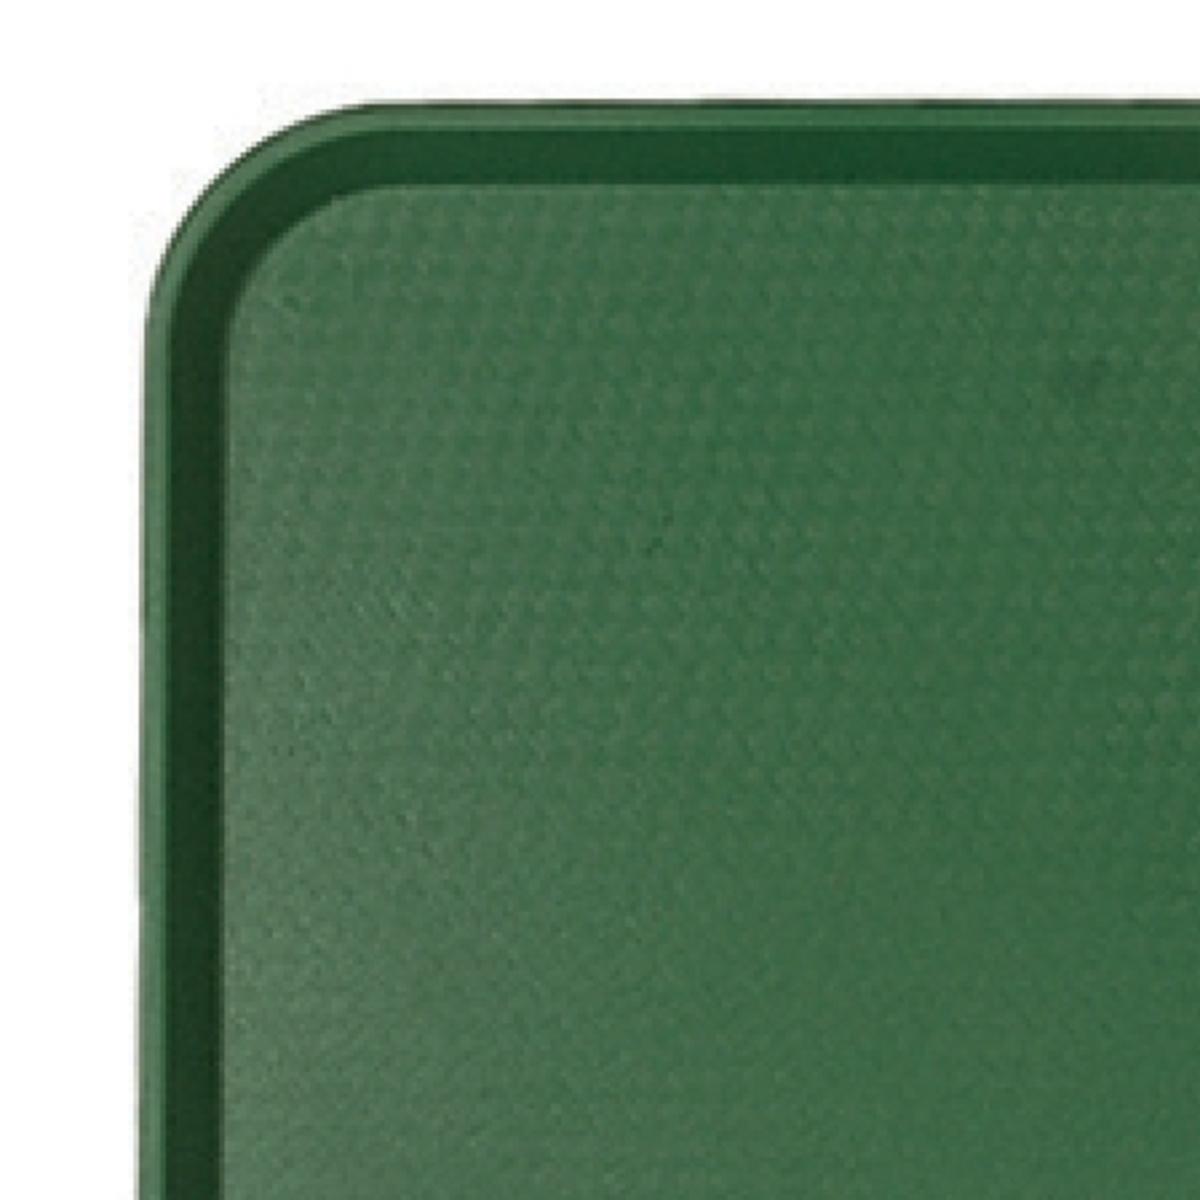 Plateau vert plastique bord droit Fast Food Cambro